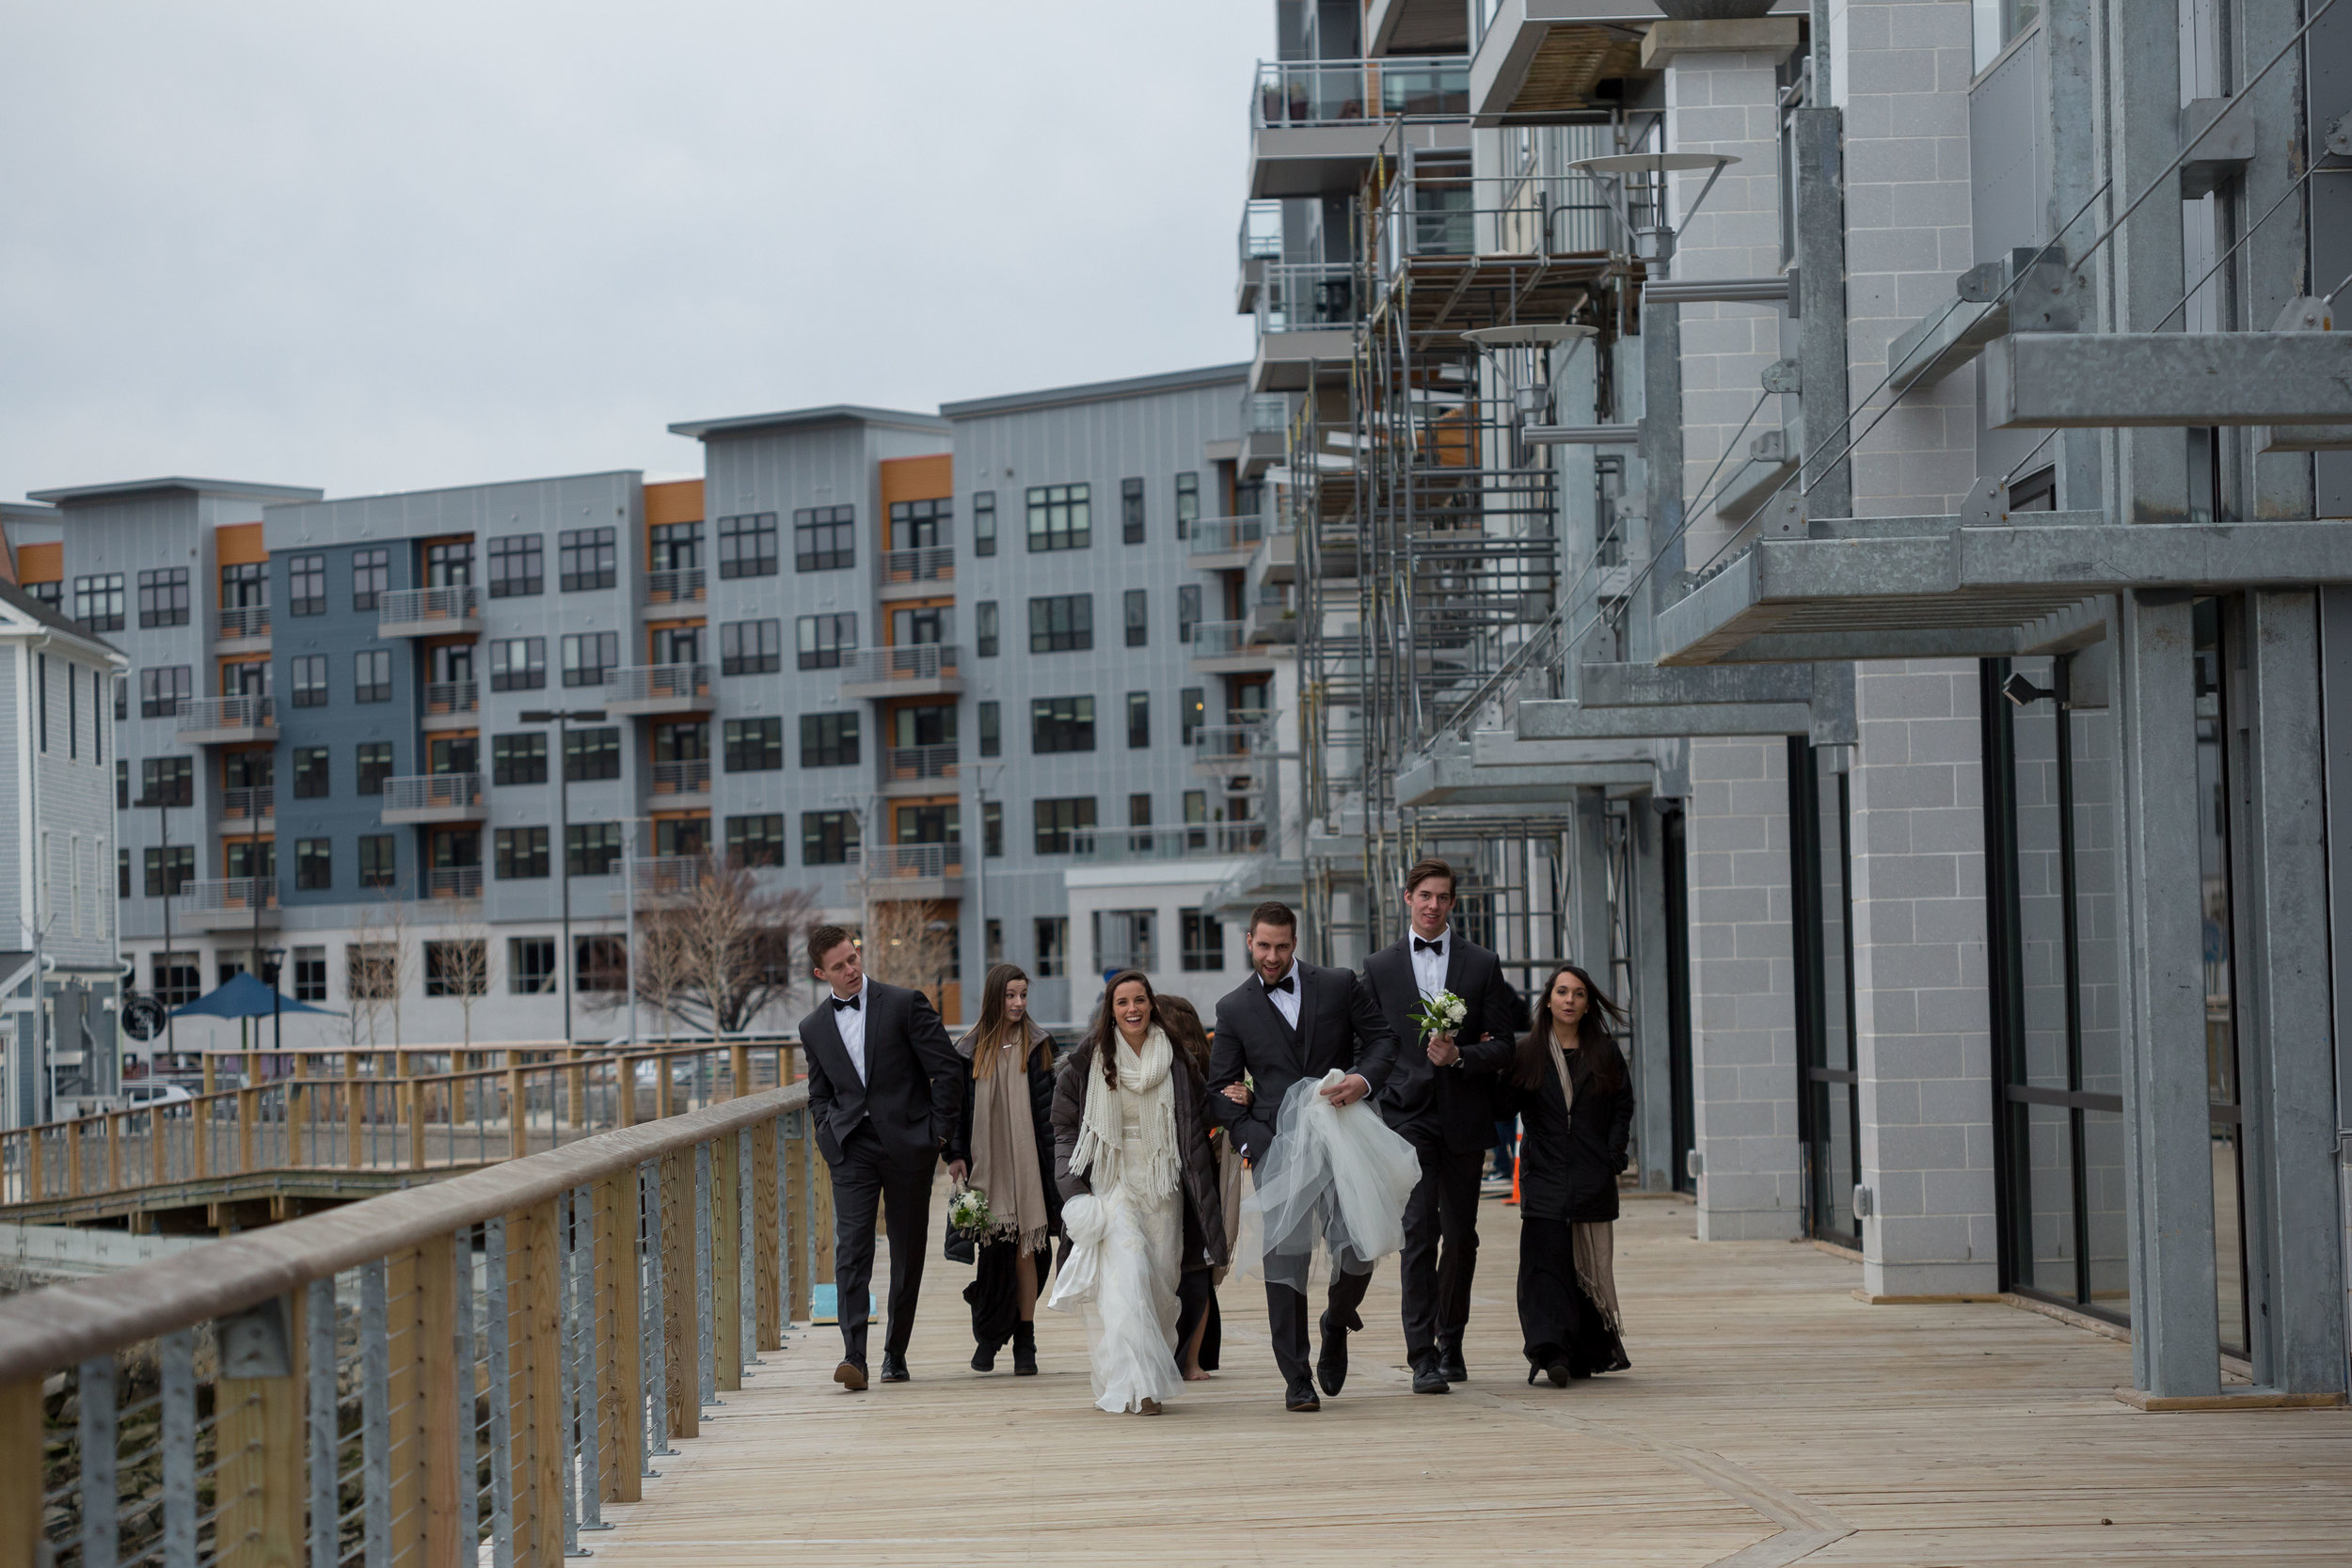 nicole-daacke-photography-boston-massachusetts-seaside-intimate-winter-wedding-photographer-24.jpg